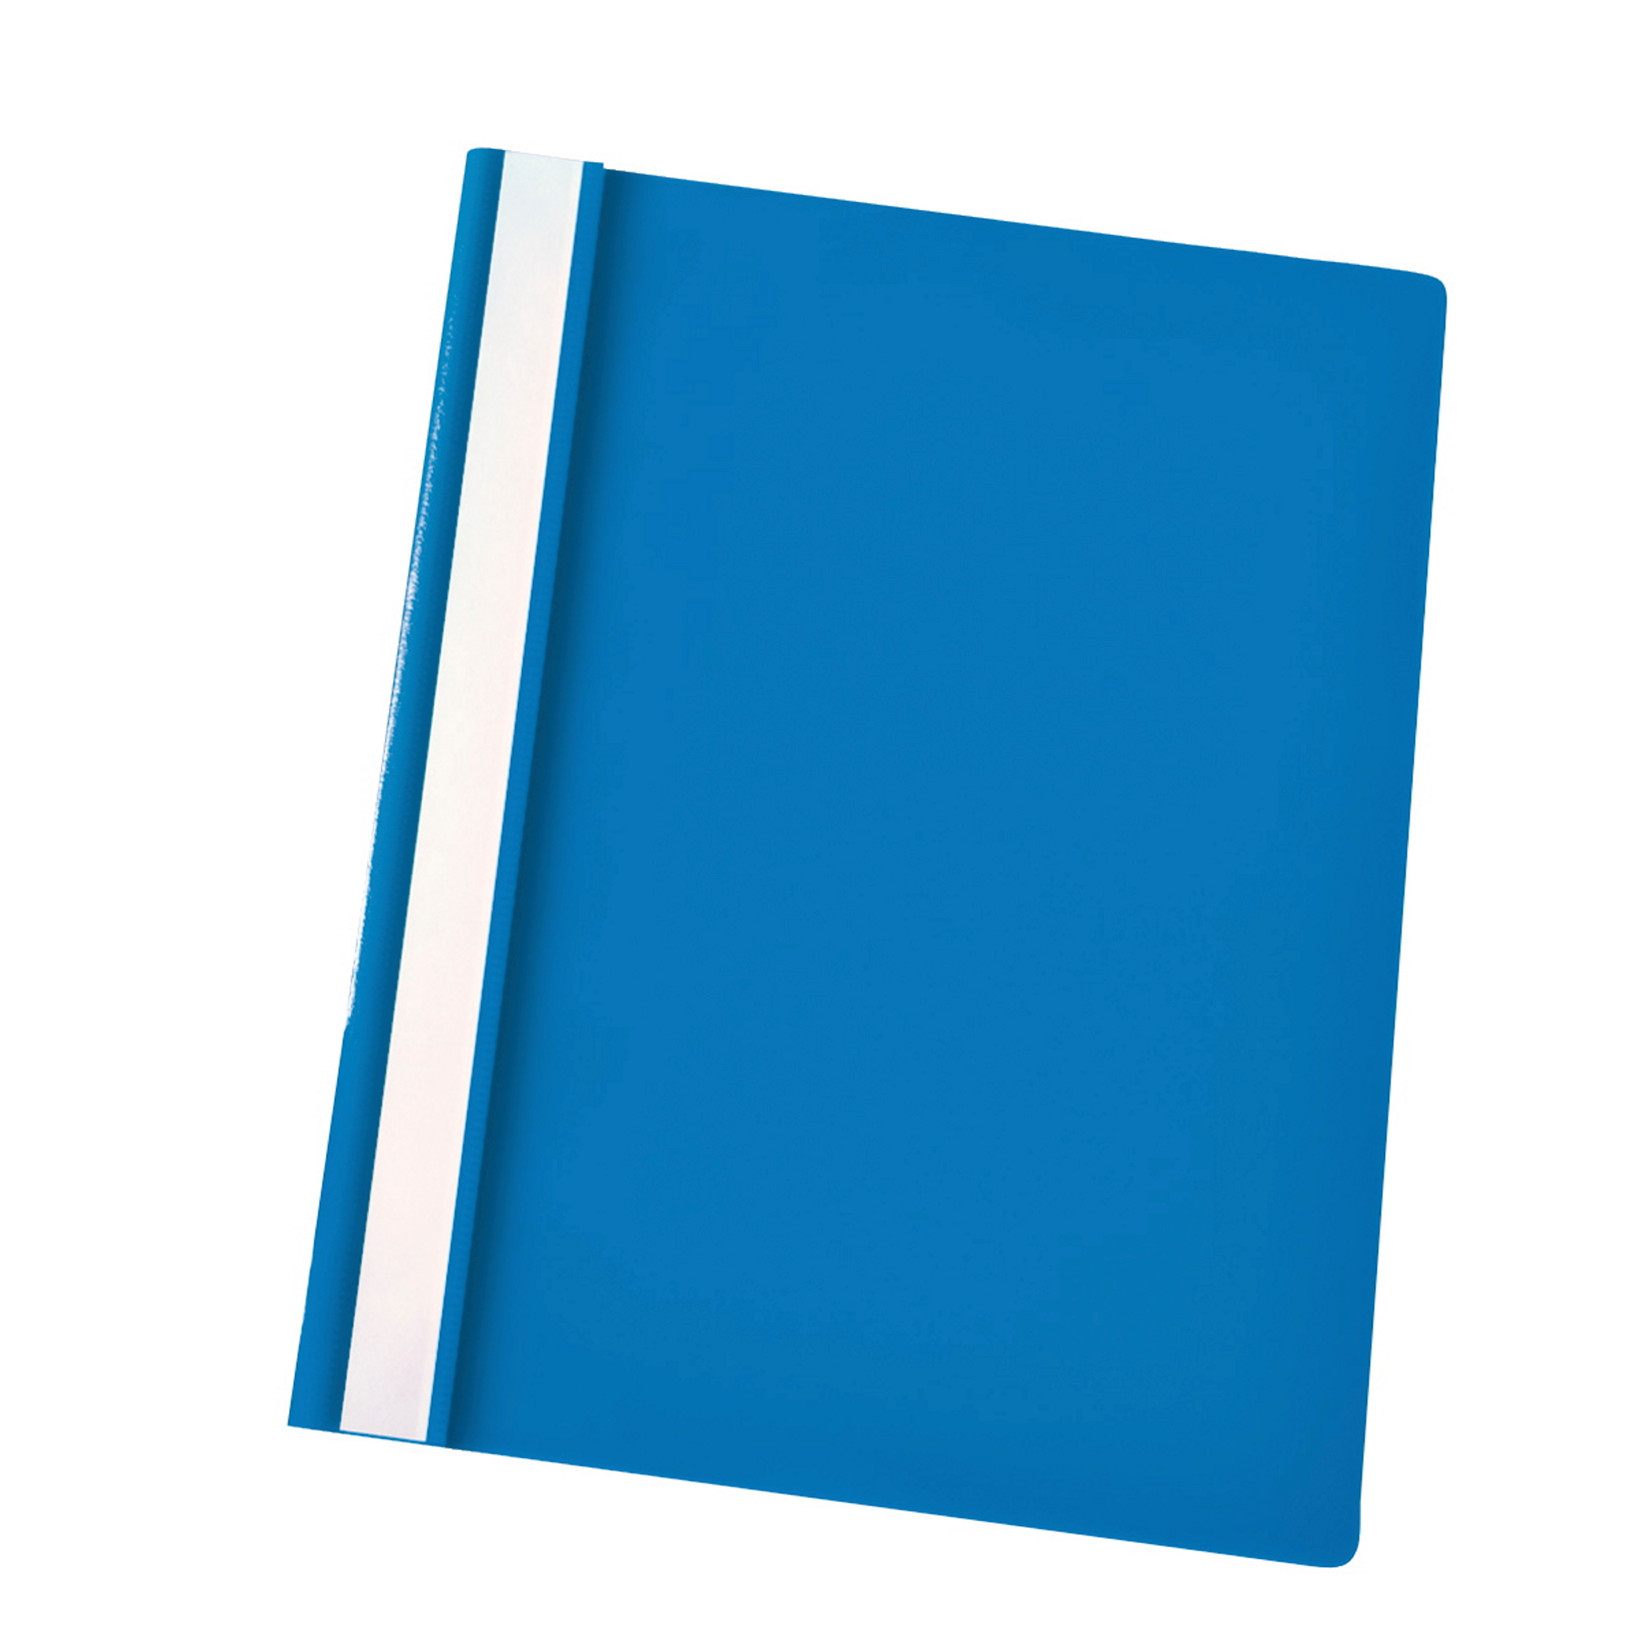 Centra A4 tilbudsmappe med split og overligger - blå med klar forside